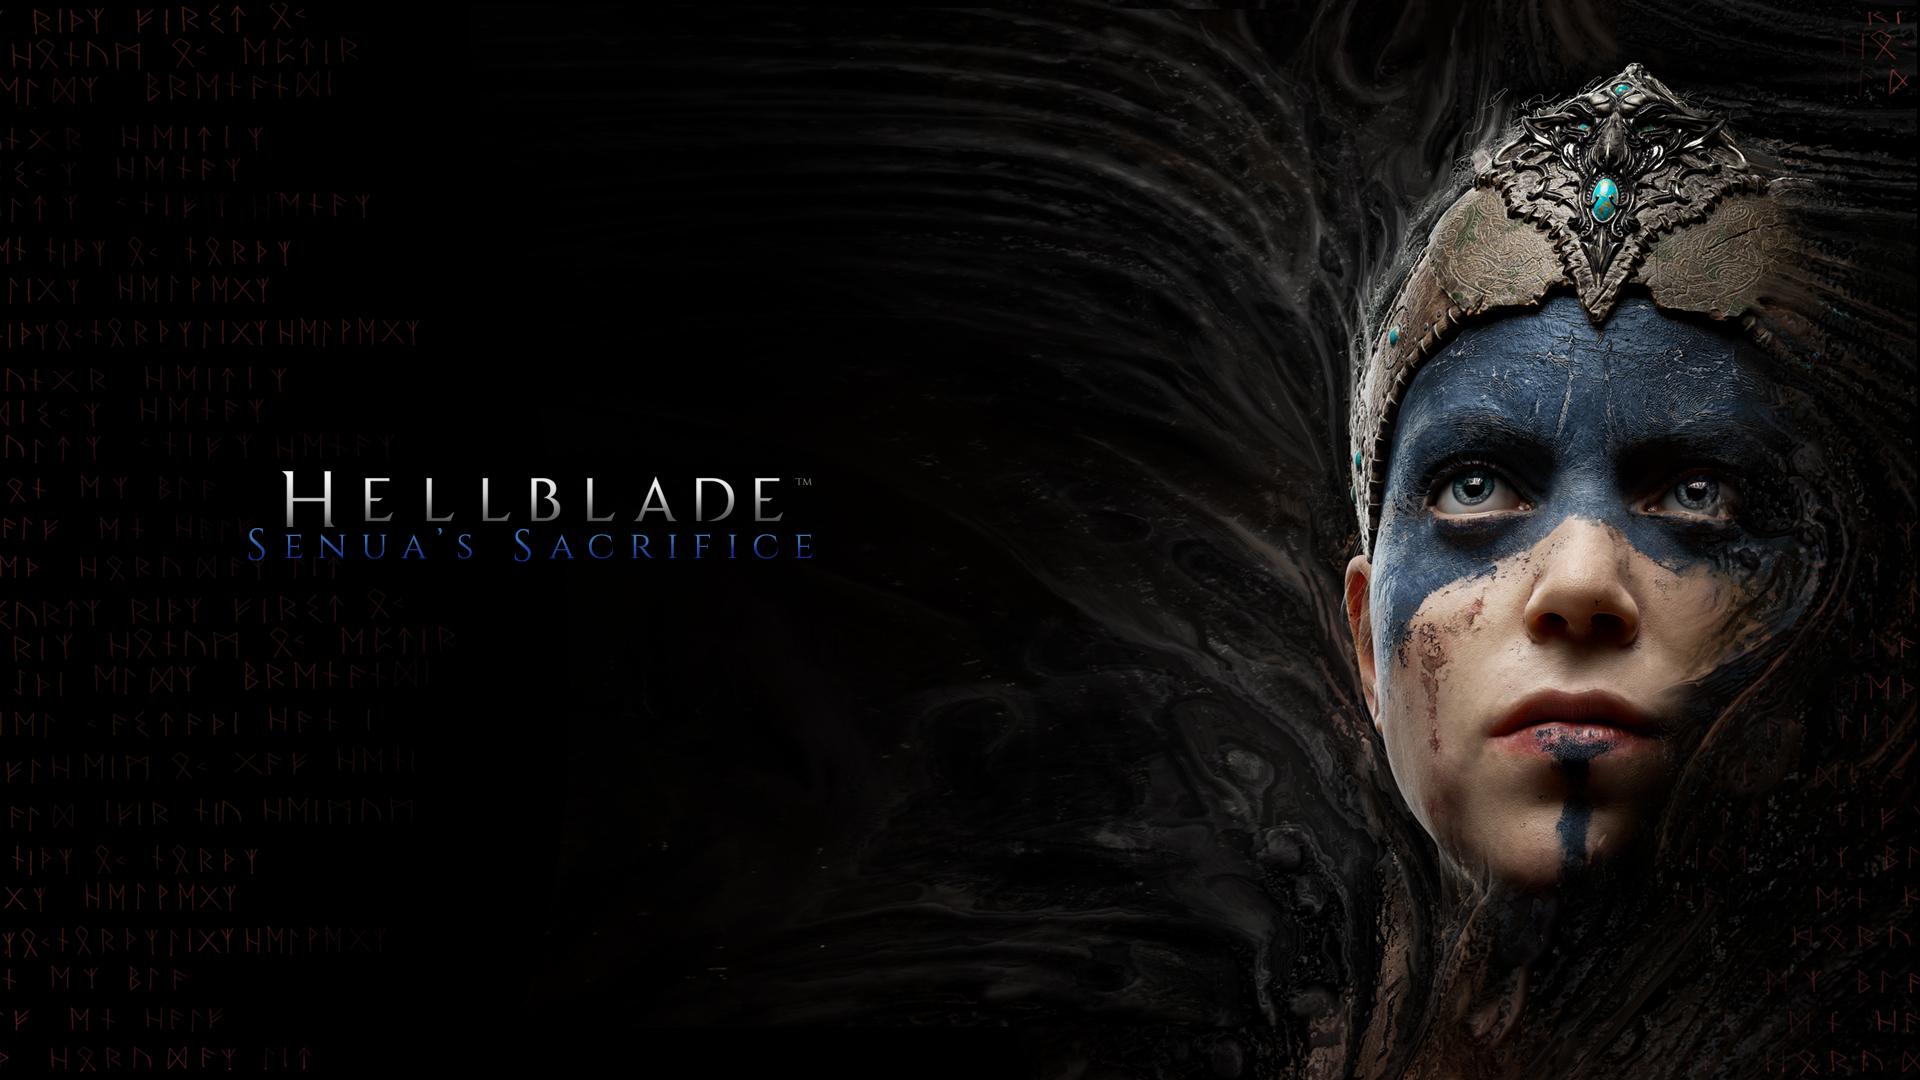 Hellblade: Senua's Sacrifice High Quality Background on Wallpapers Vista